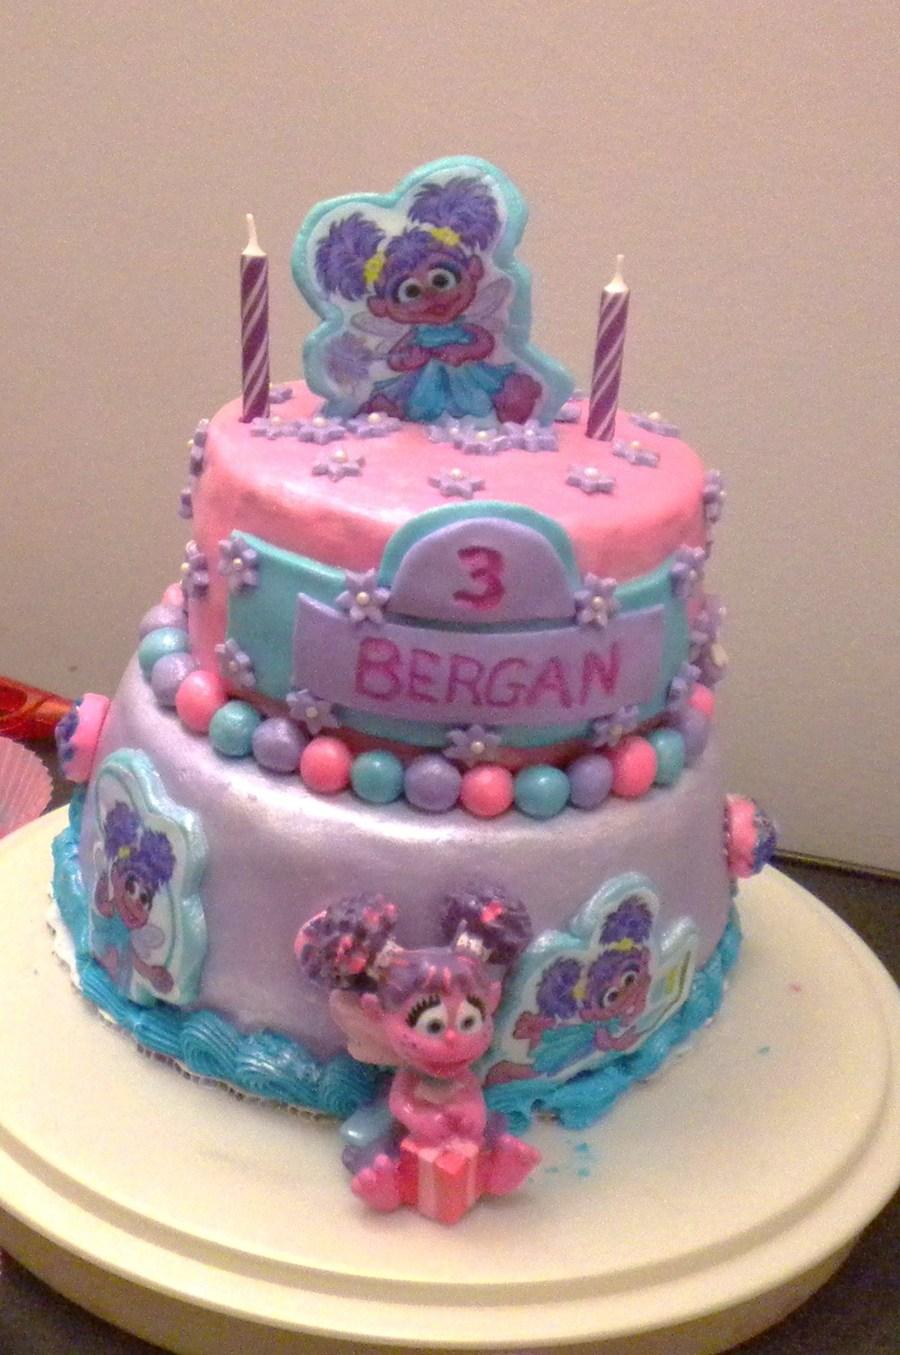 Pleasing Abby Cadabby Birthday Cake Cakecentral Com Personalised Birthday Cards Veneteletsinfo